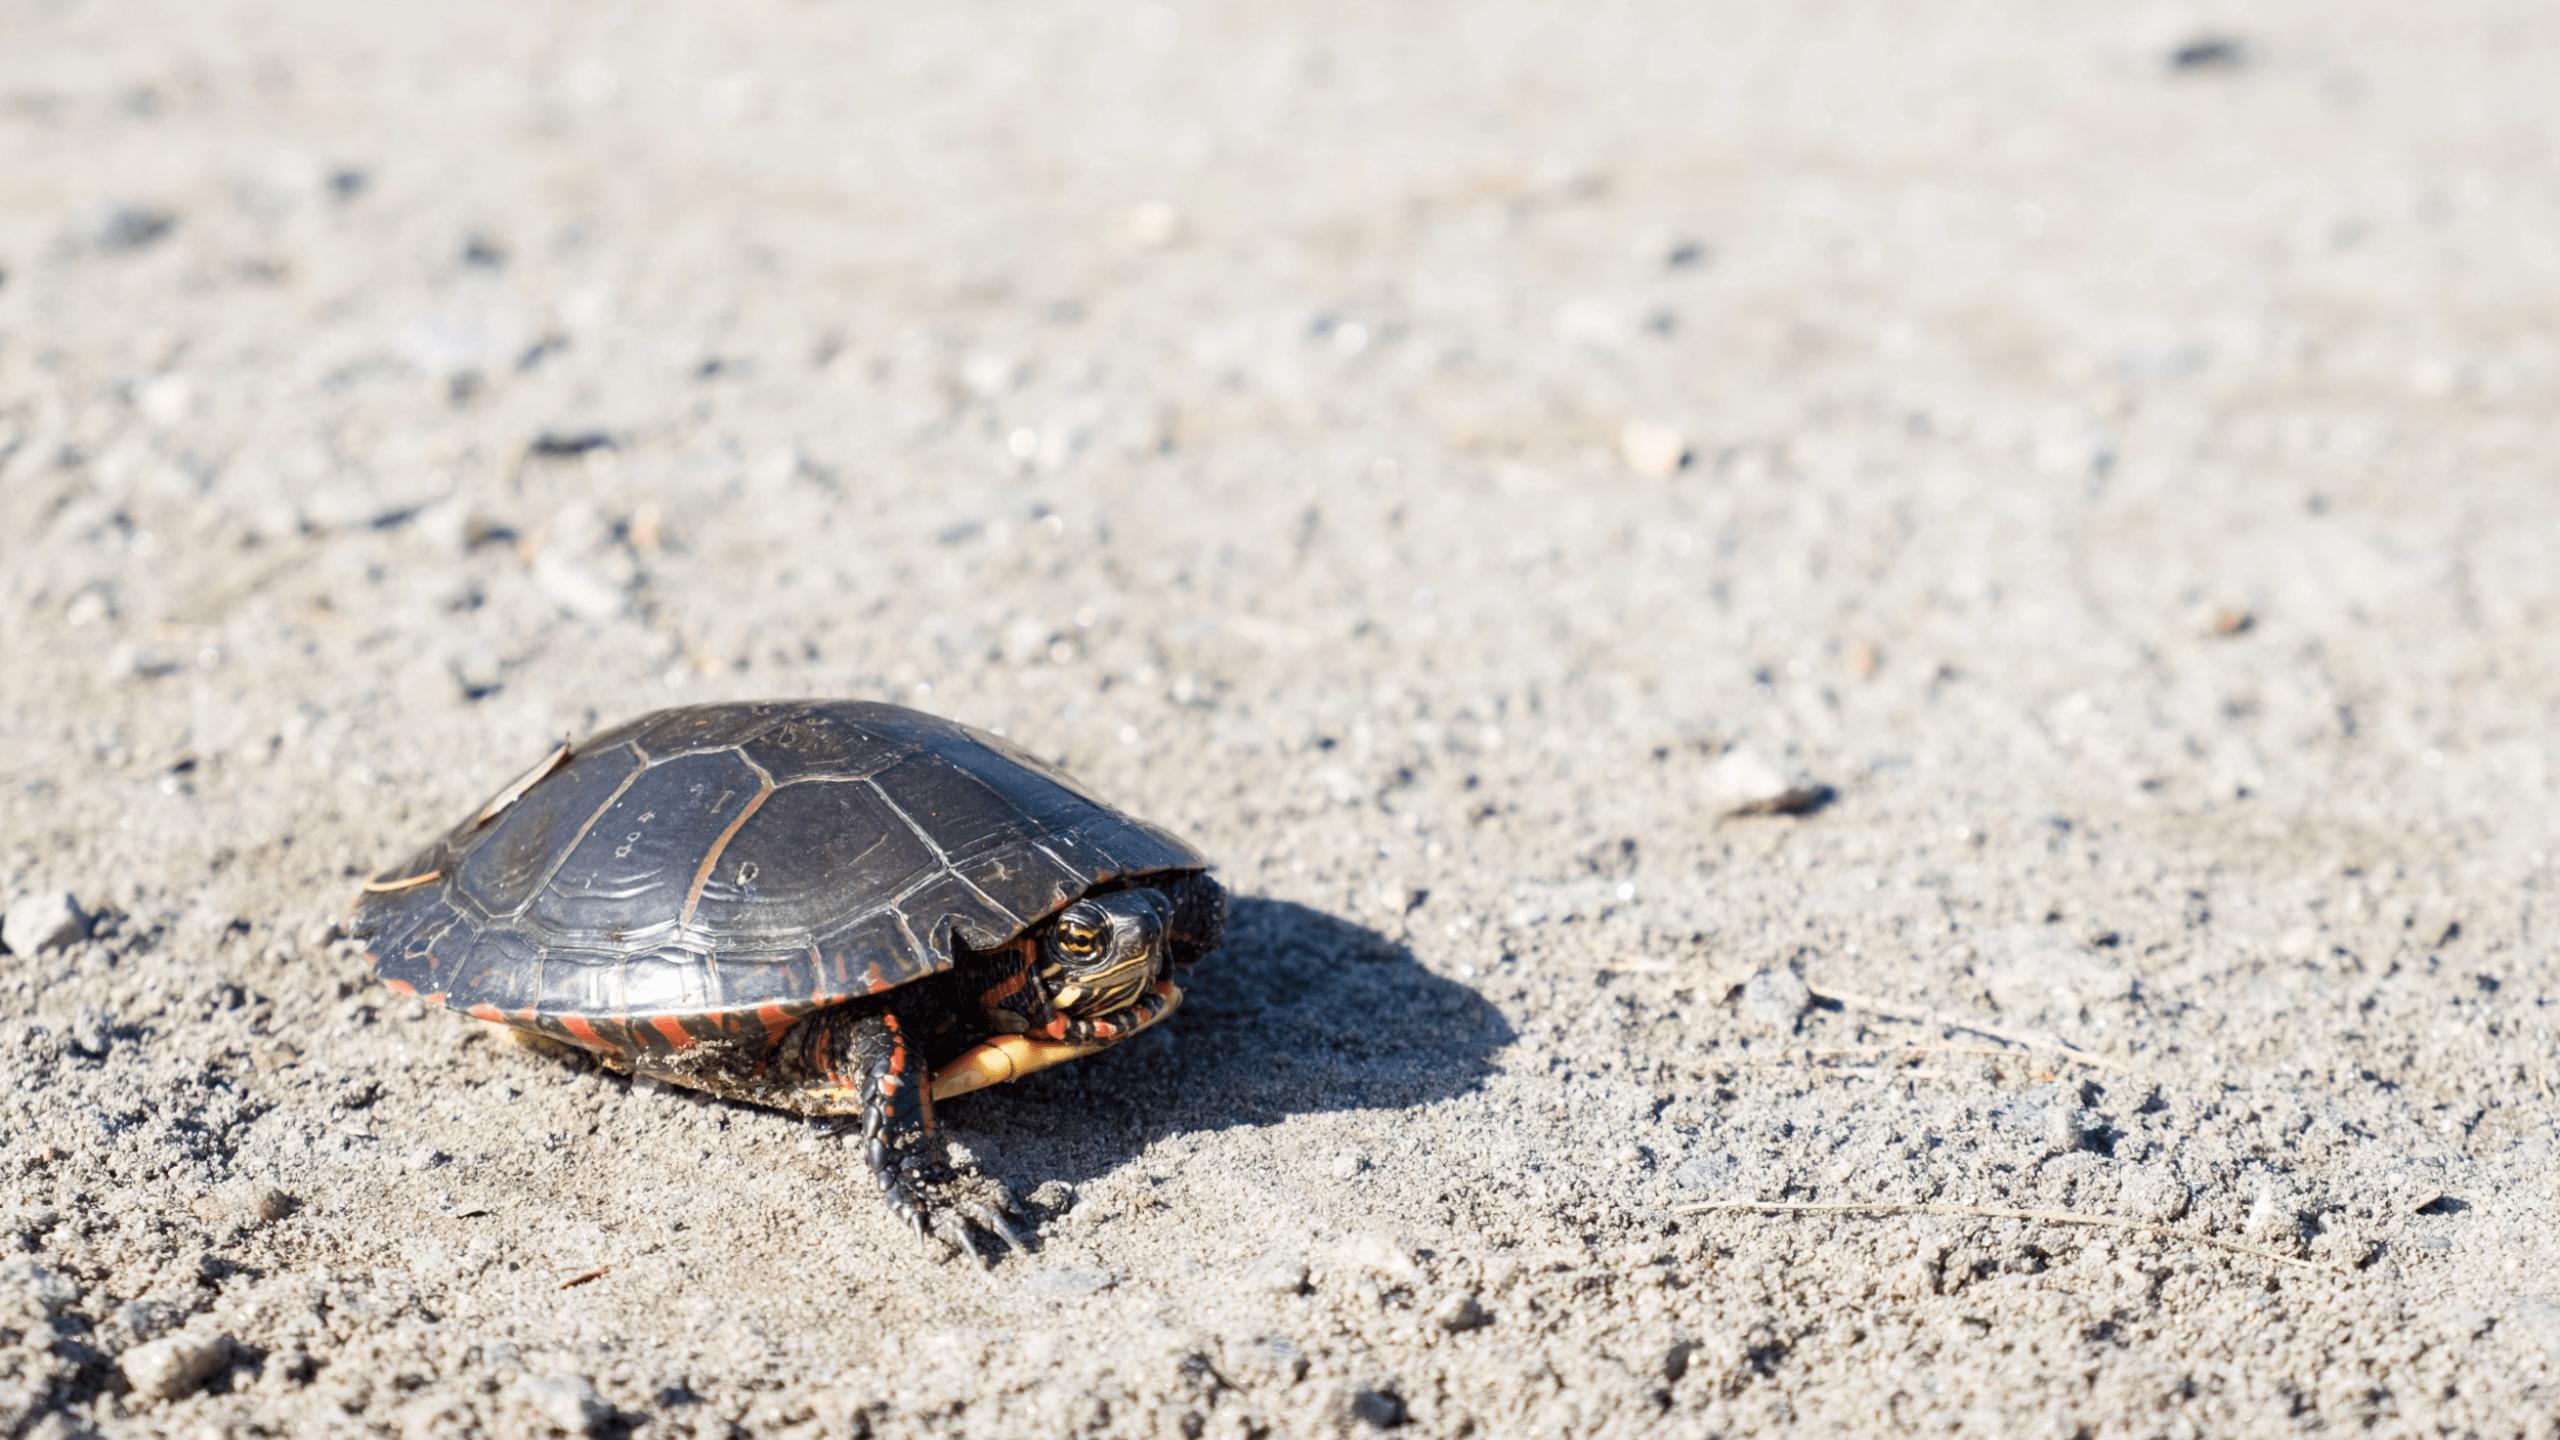 Emydidae,                Turtle,                Box,                Reptile,                Terrestrial,                Animal,                Sand,                Sea,                Tortoise,                Photography,                Photo,                White,                 Free Image